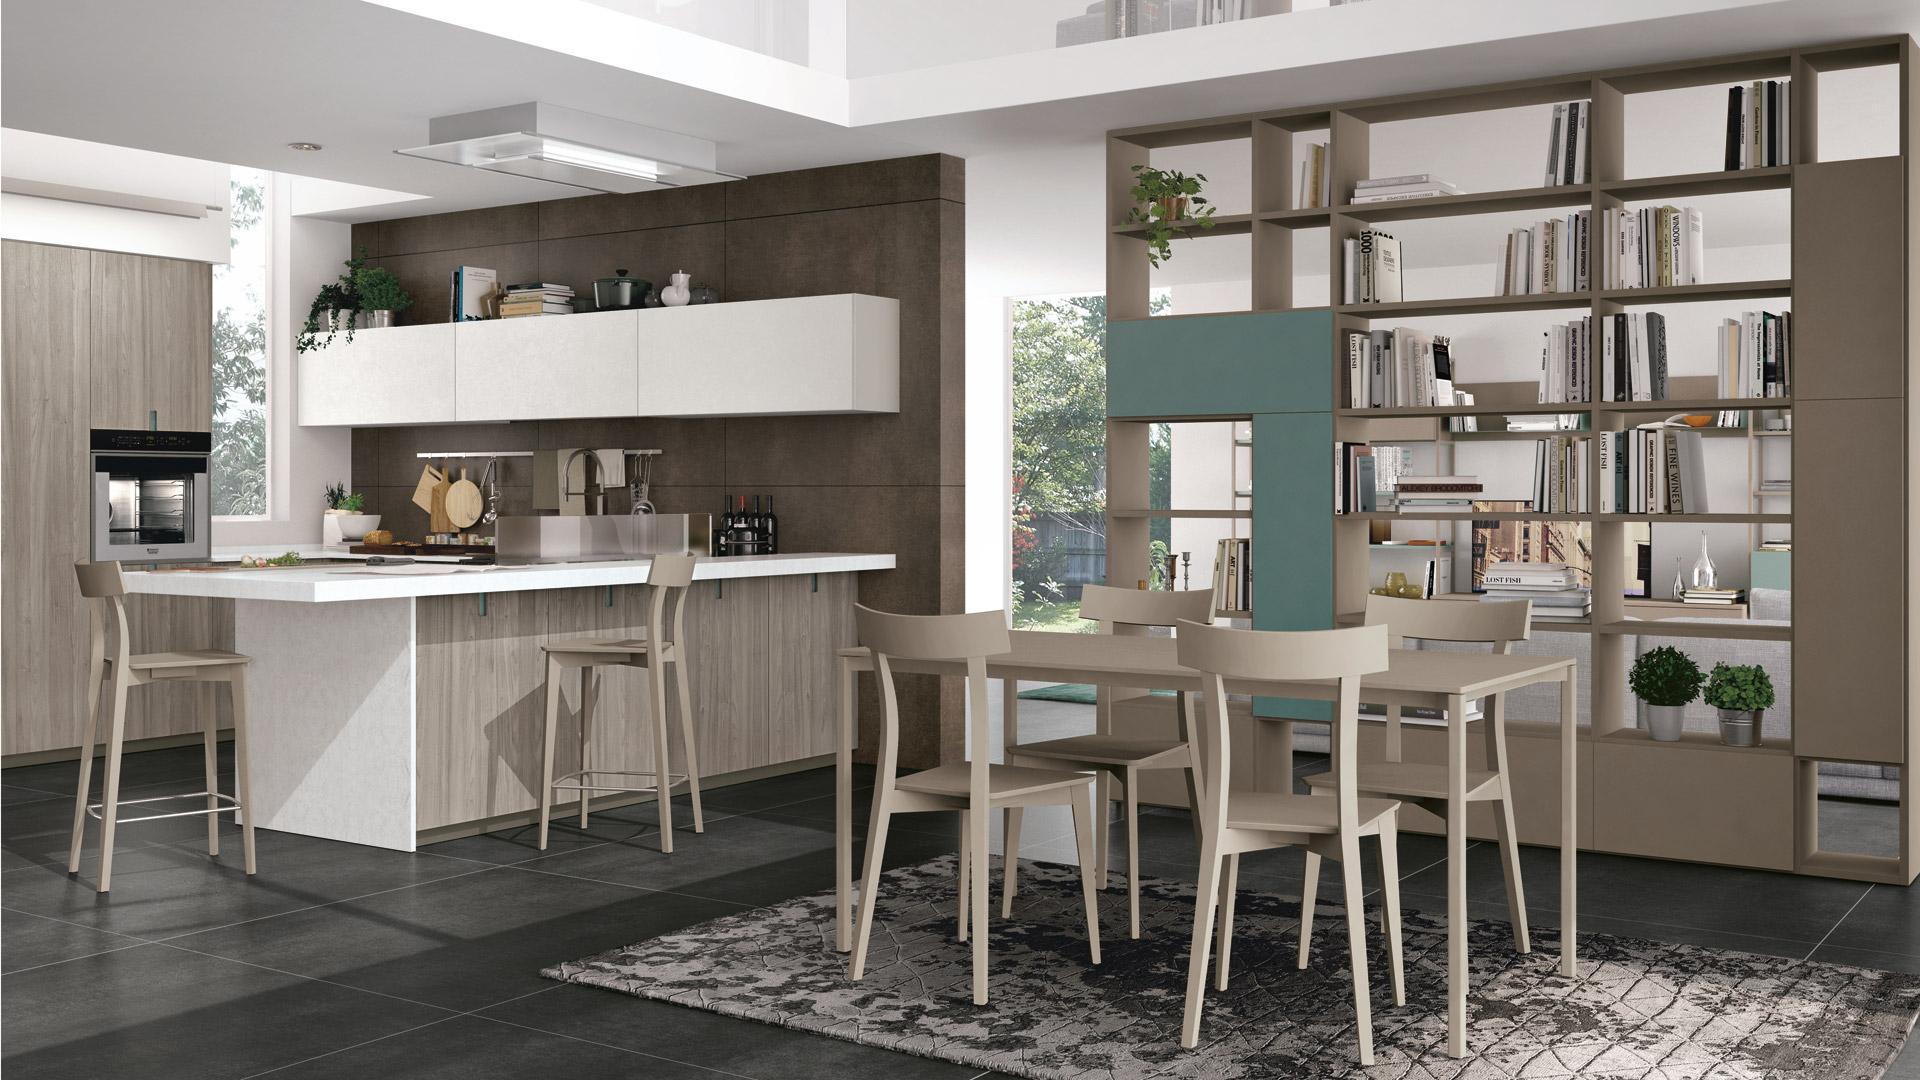 Tavoli, sedie e design - Cucine Lube